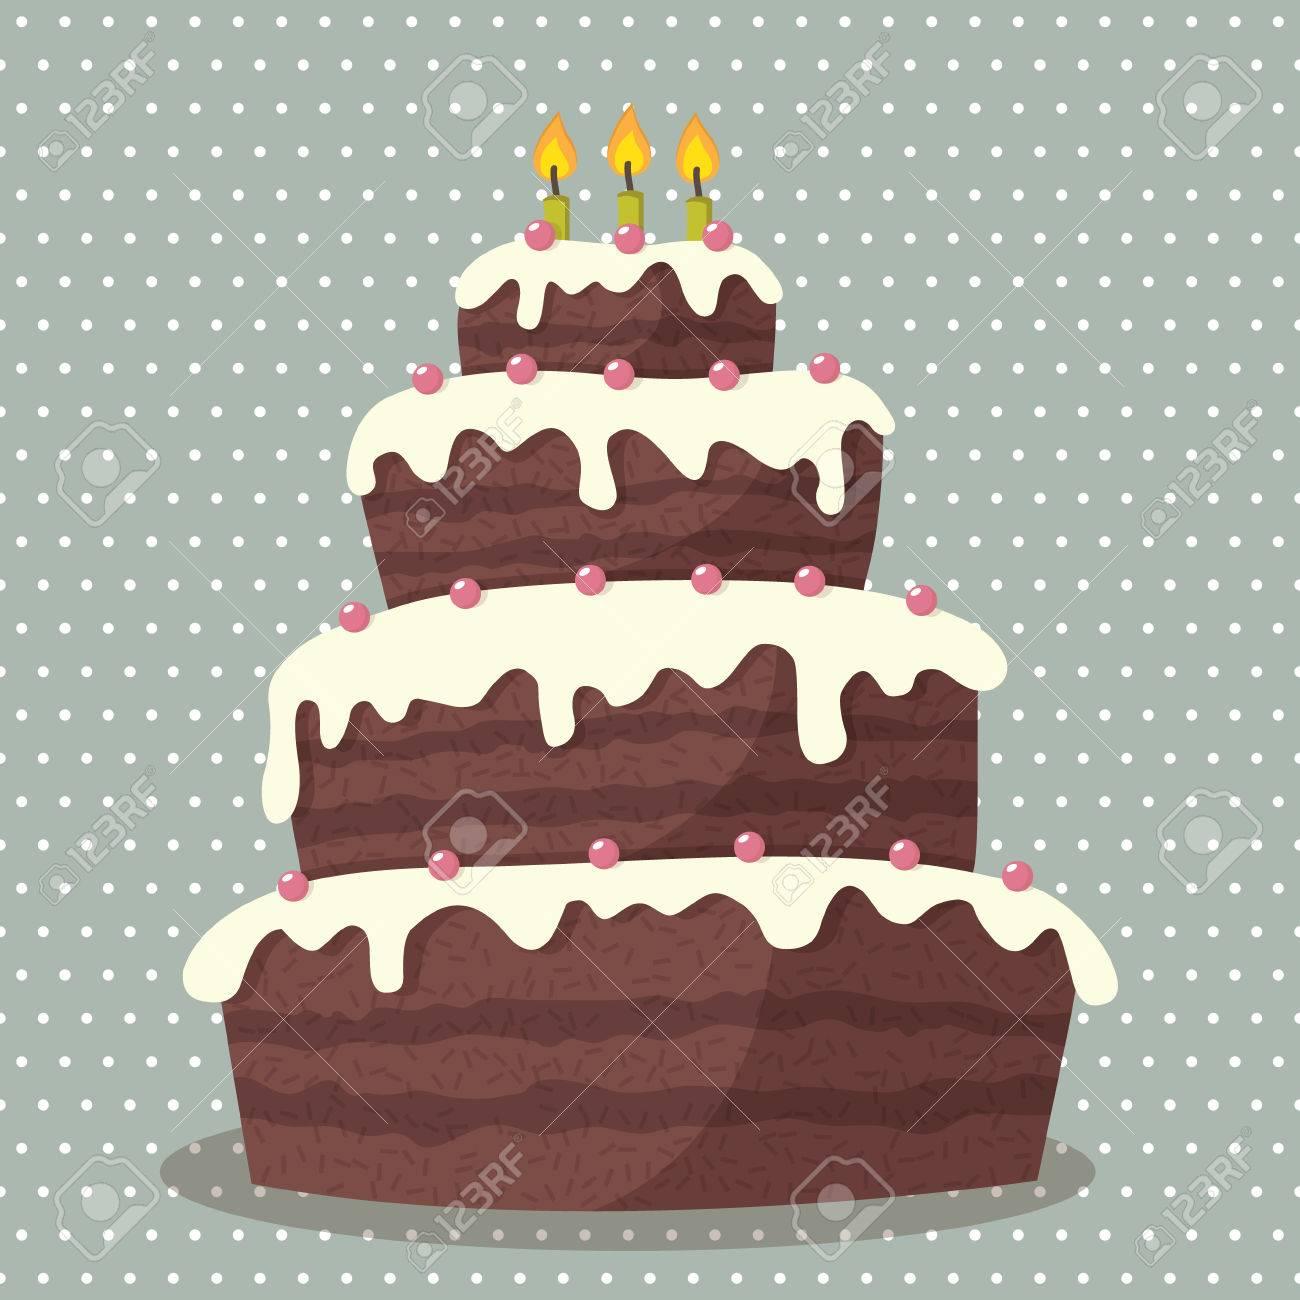 Cool Birthday Cake Illustration Of Cute Birthday Cake With Three Funny Birthday Cards Online Fluifree Goldxyz